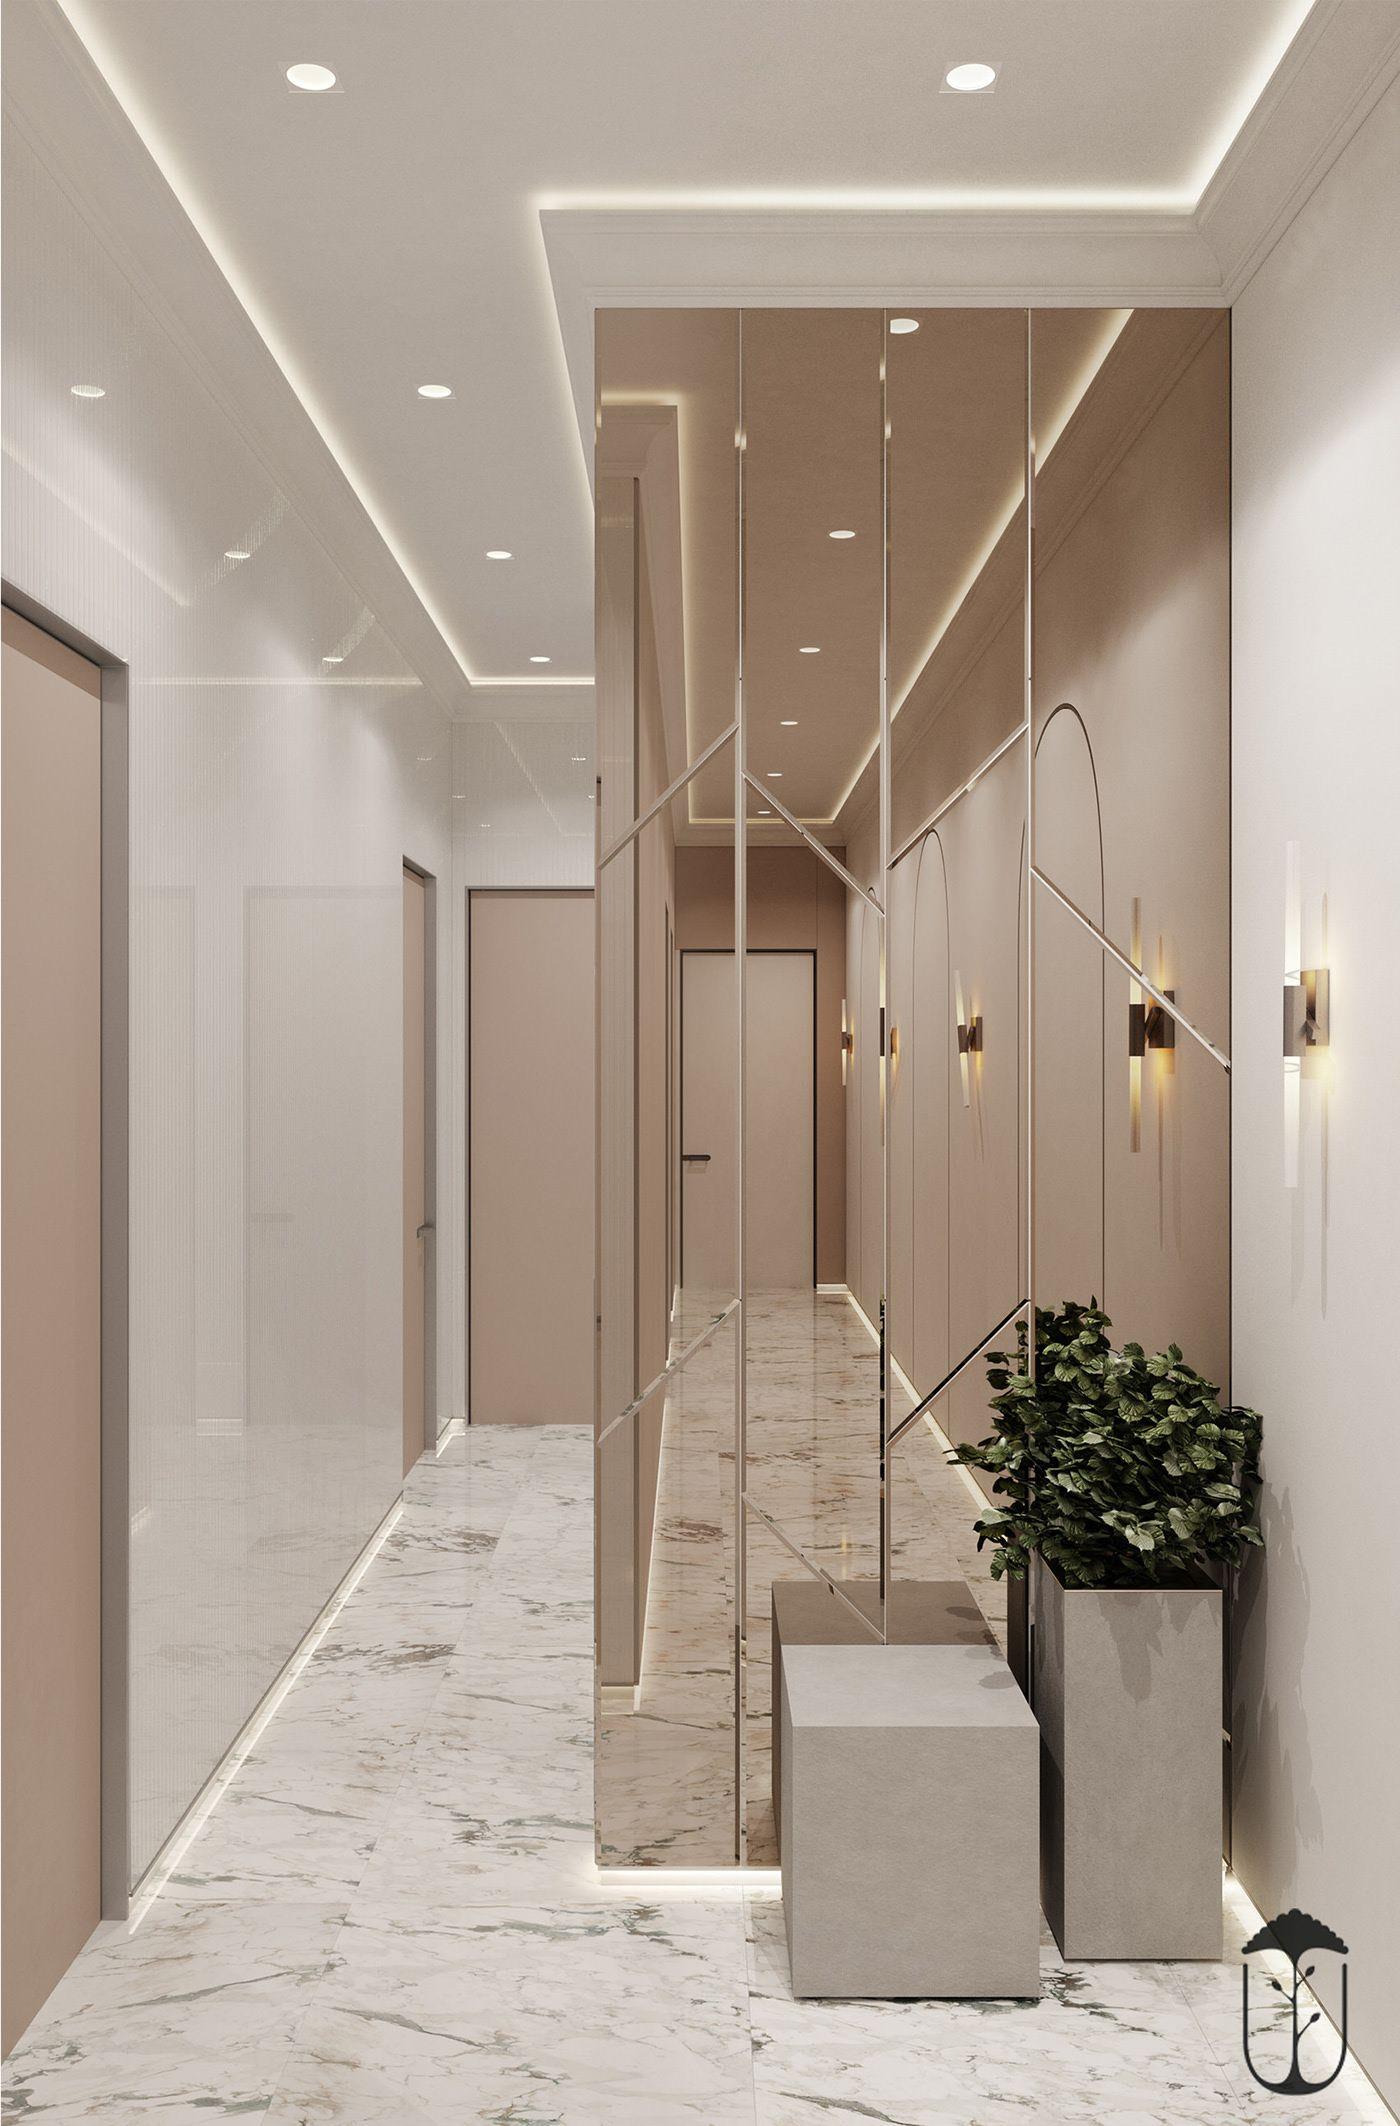 Ui029 On Behance Clinic Interior Design Corridor Design Home Room Design